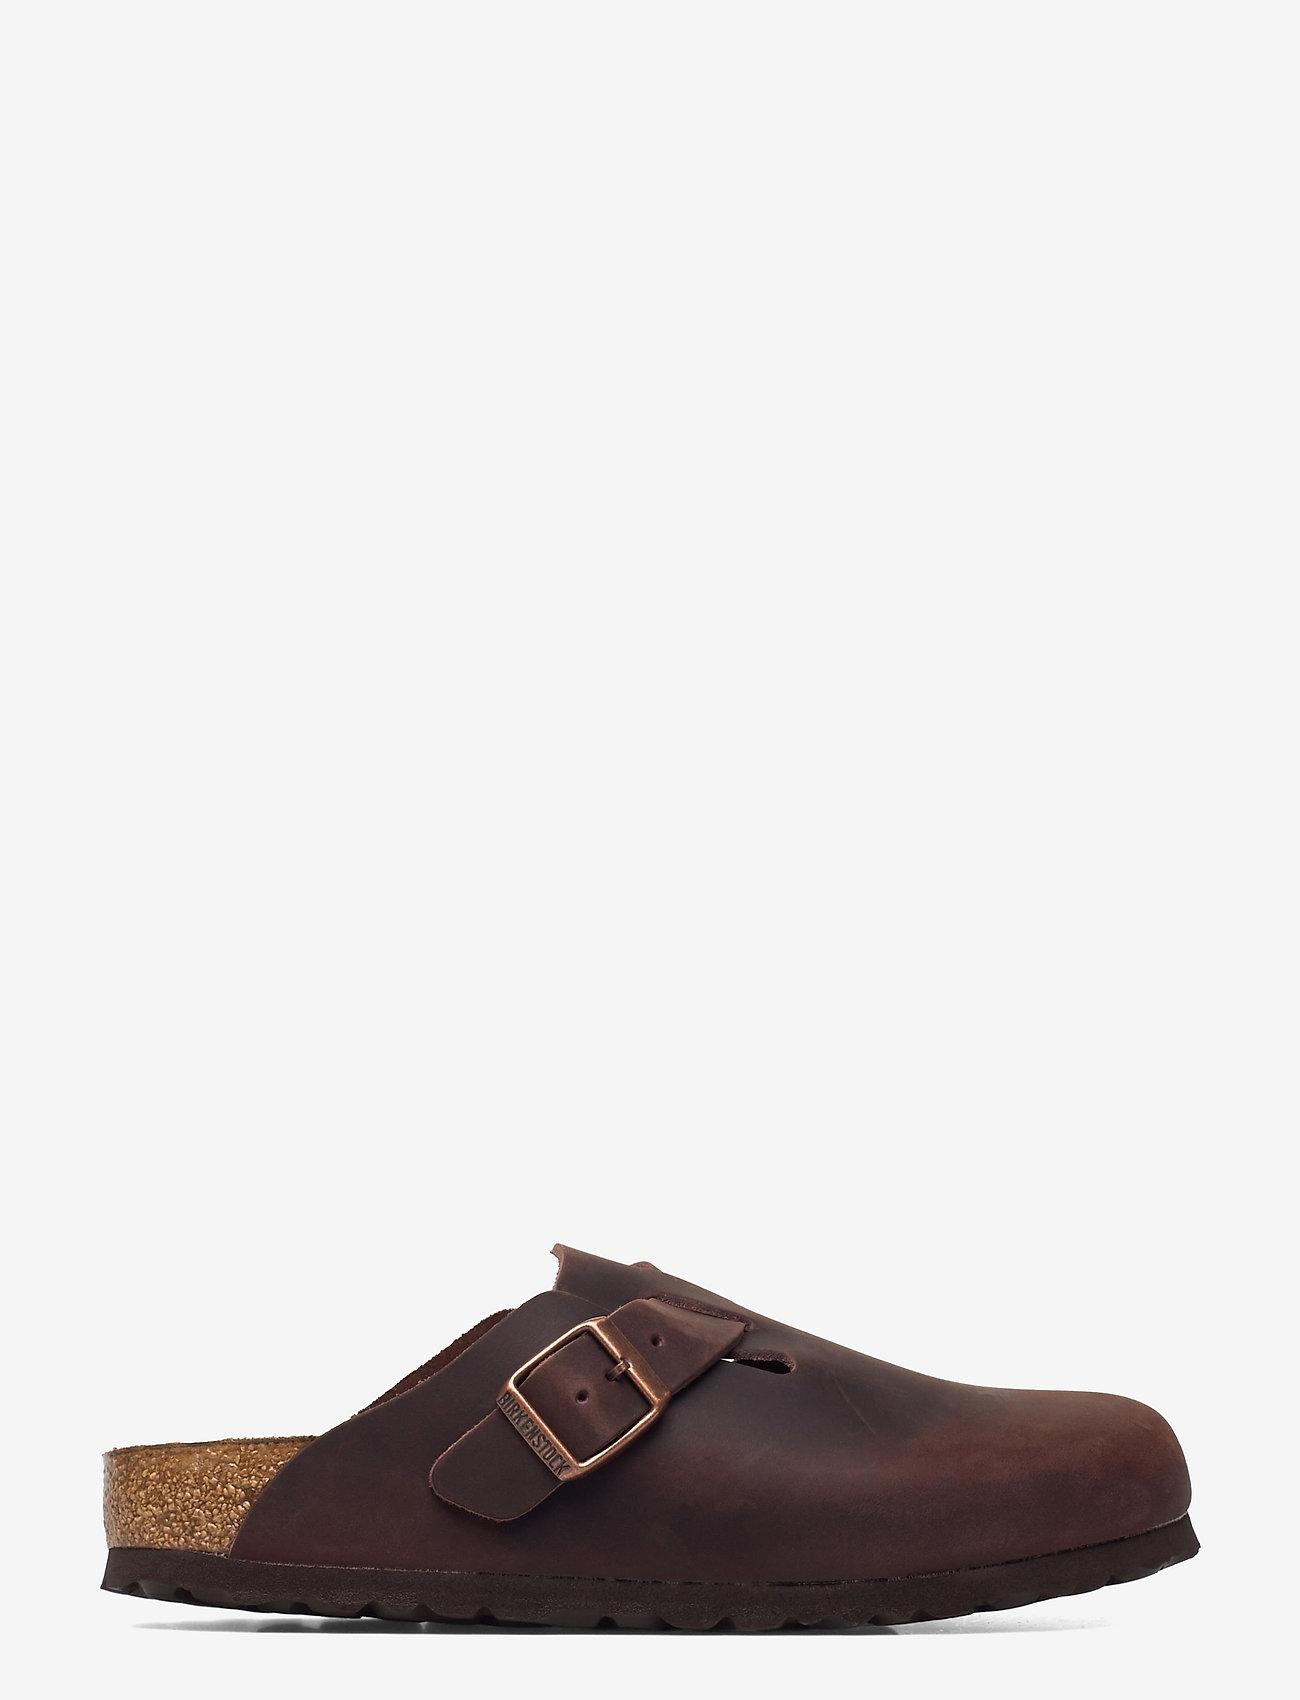 Birkenstock - Boston - mules & slipins - habana - 1